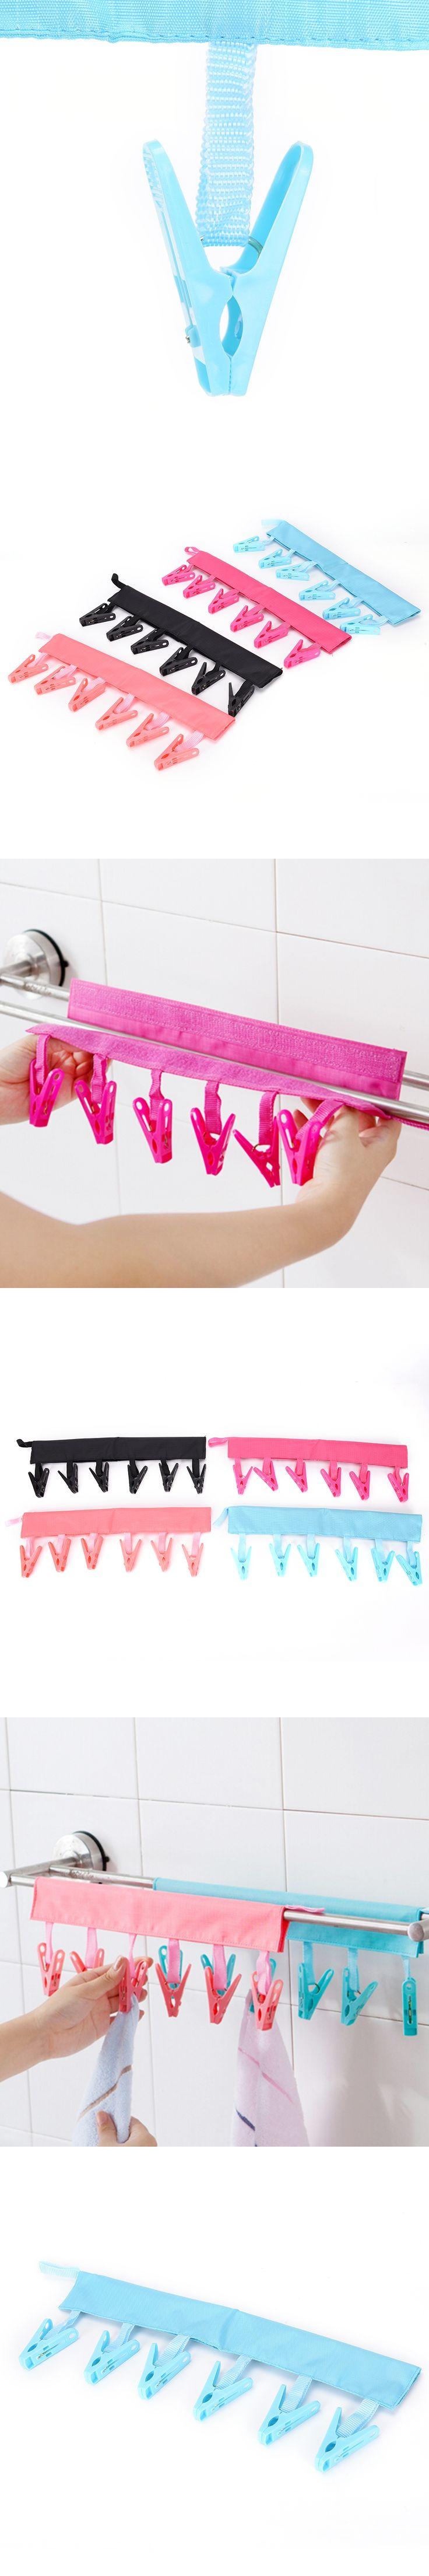 2017 Hot Sale Multifunction Socks Drying Racks Bathroom Rack Traveling Clothespin Travel Portable Folding Cloth Hanger Clips